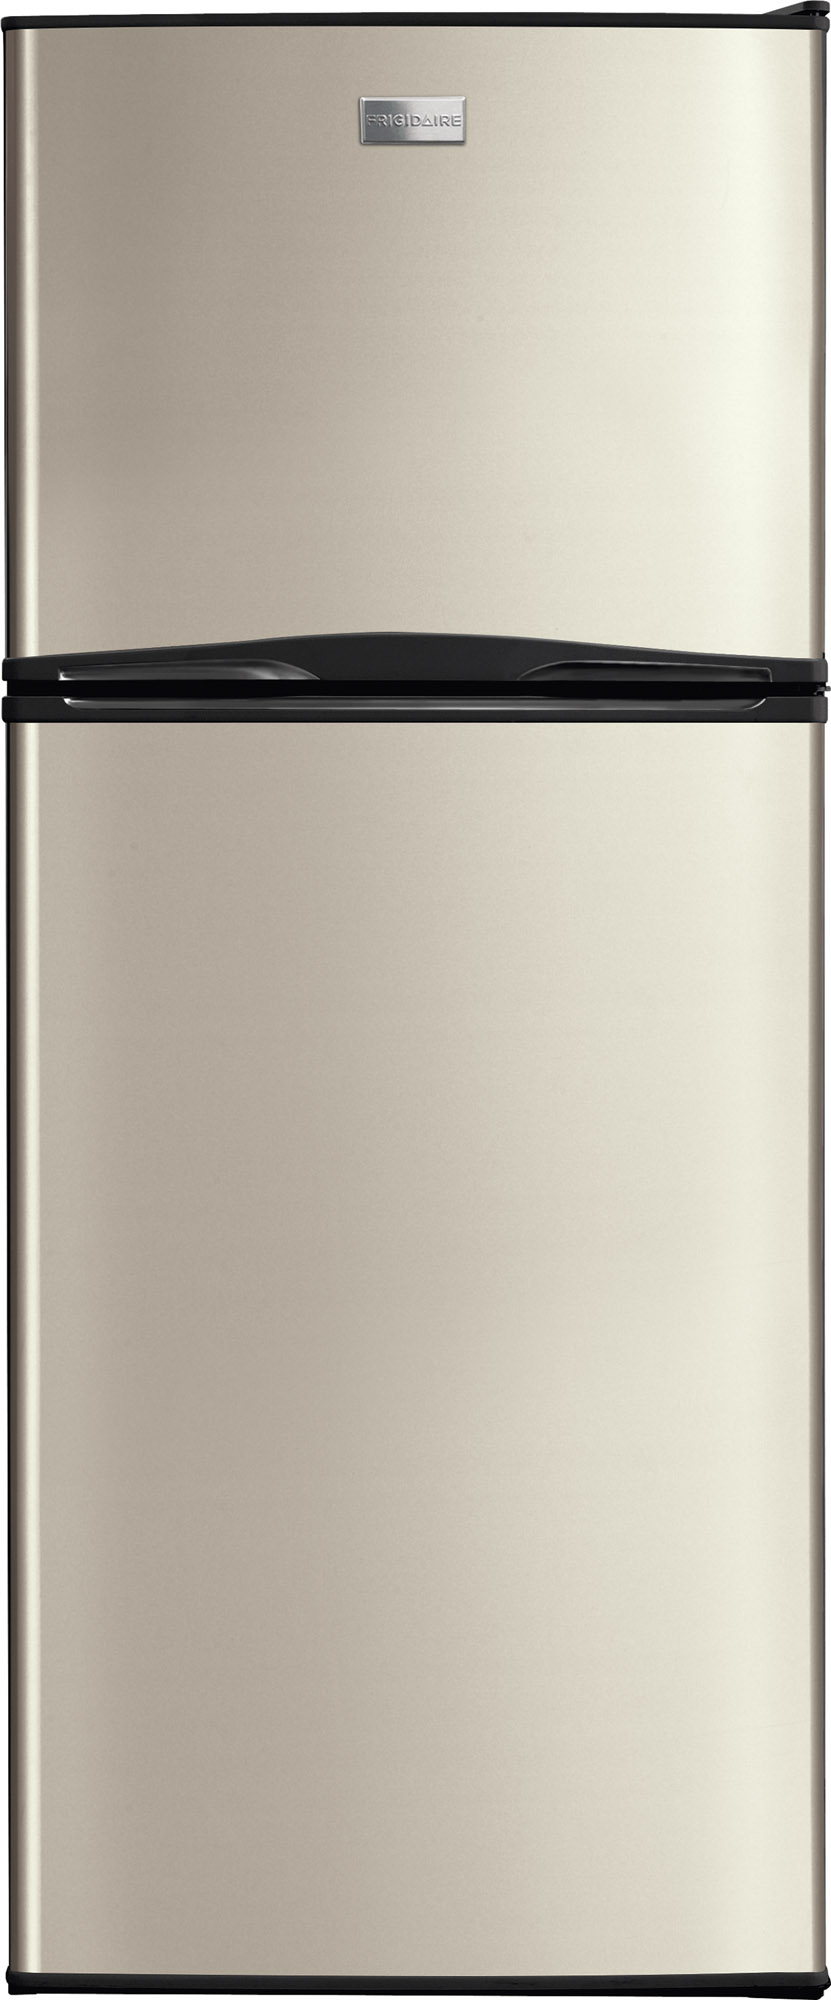 Frigidaire 12 Cu. Ft. Top Freezer Apartment Size Refrigerator ...